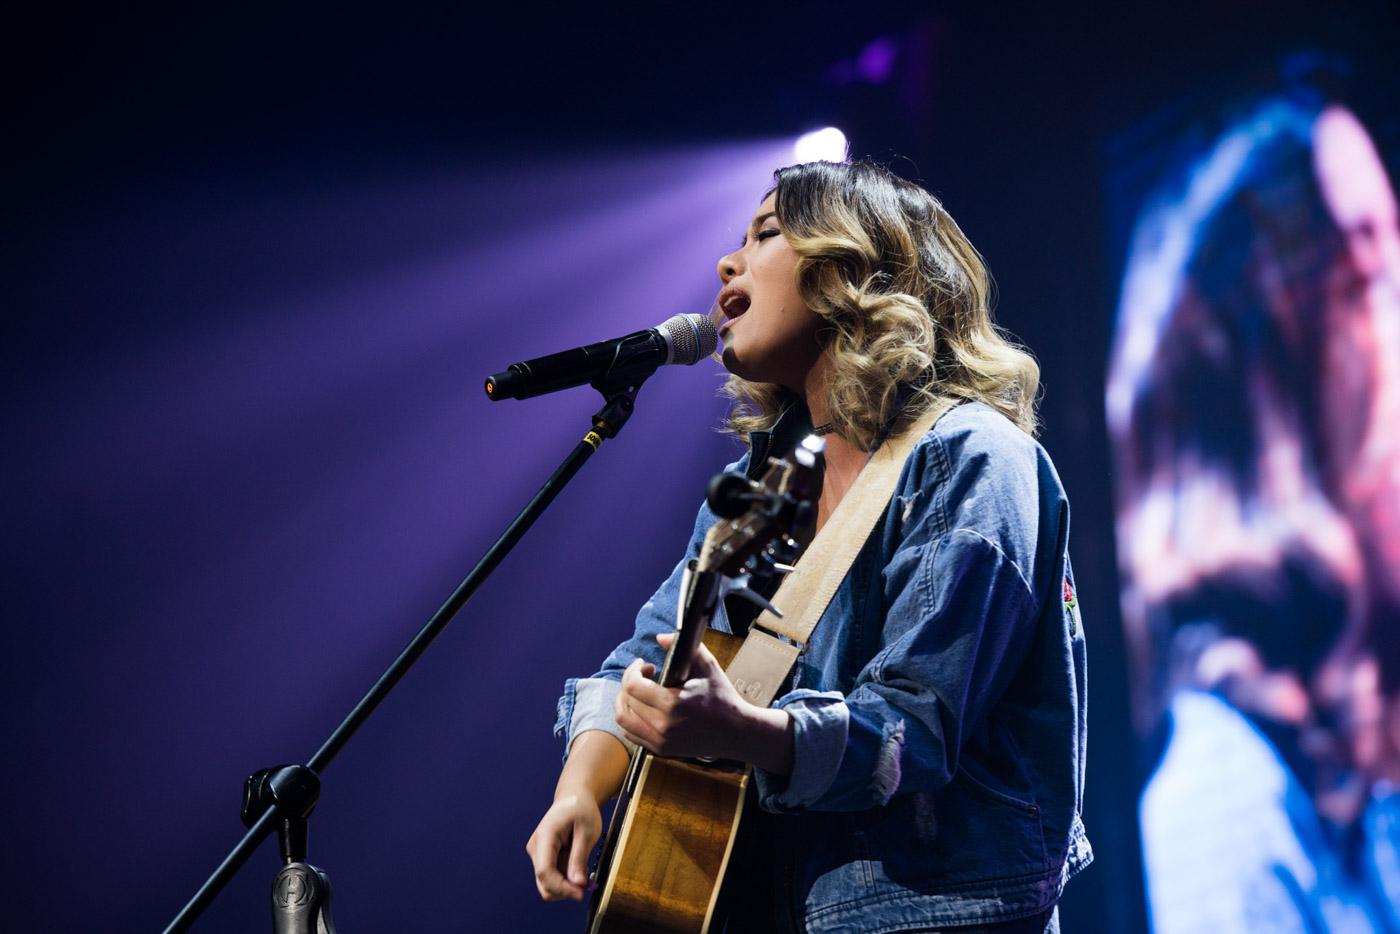 KEIKO NECESARIO. The singer-songwriter performs ahead of Sandara.